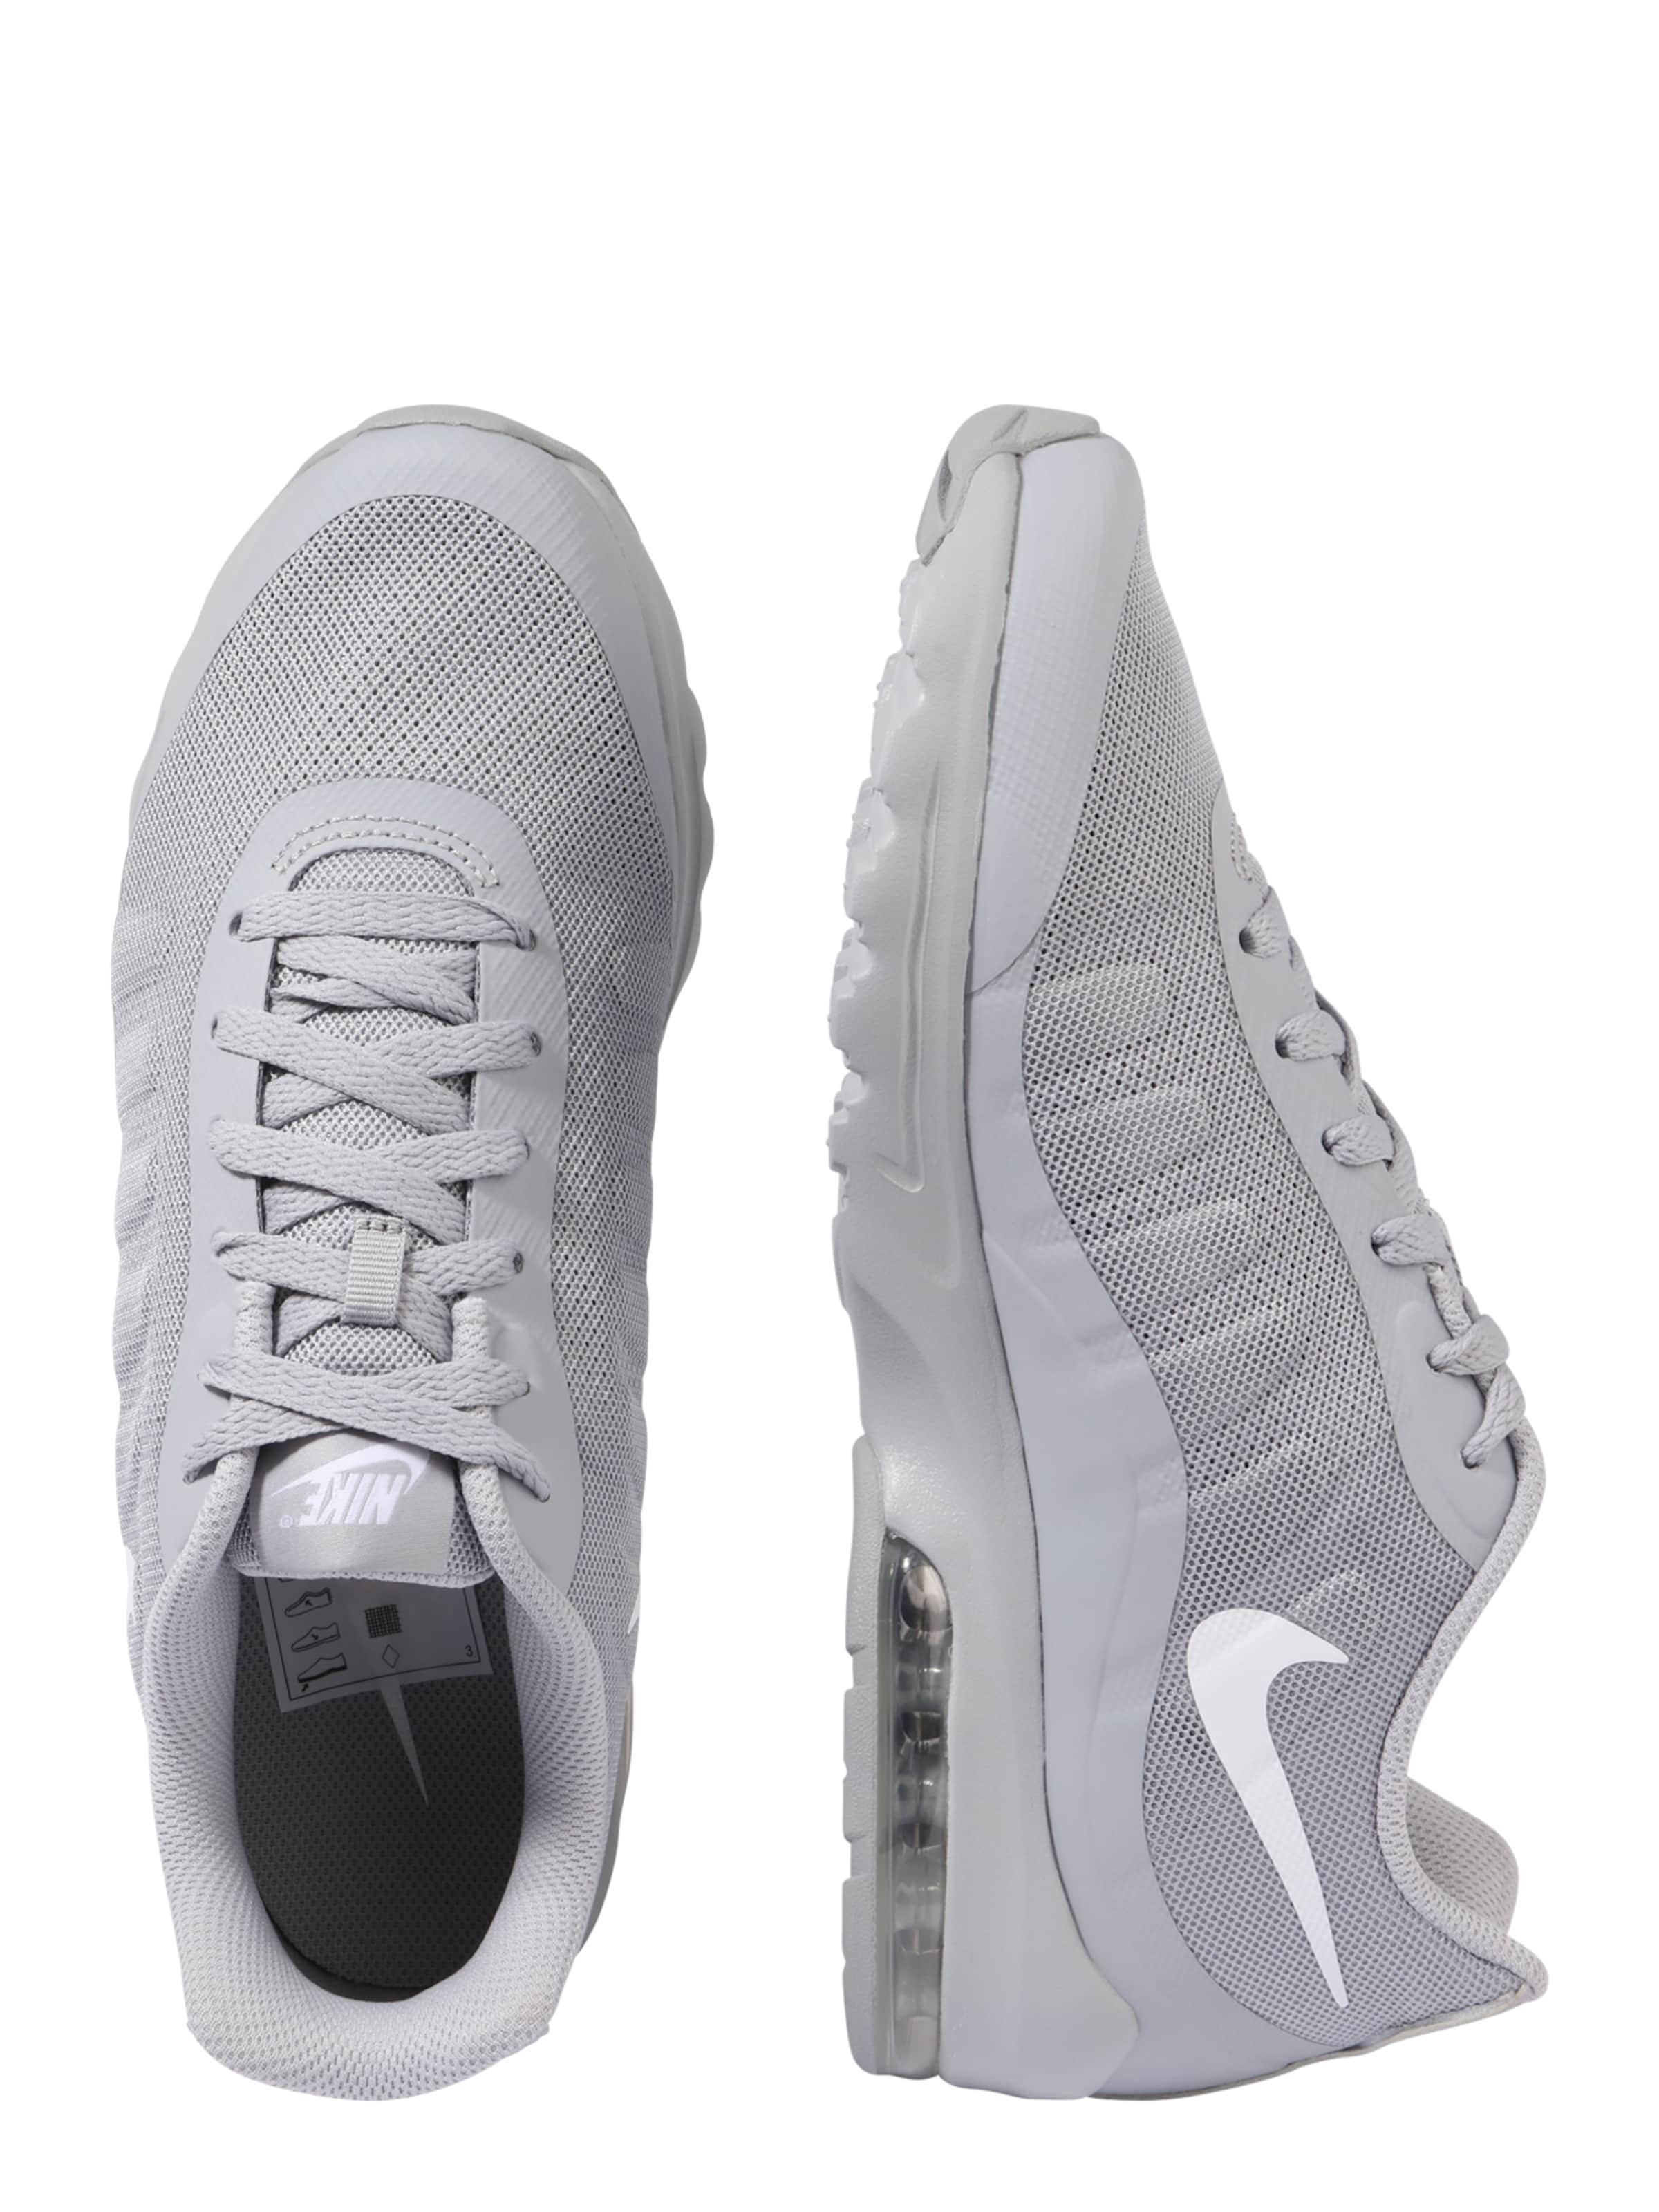 GrauWeiß Sneaker Sportswear Invigor' Max 'air Nike In XZwPkuOTi